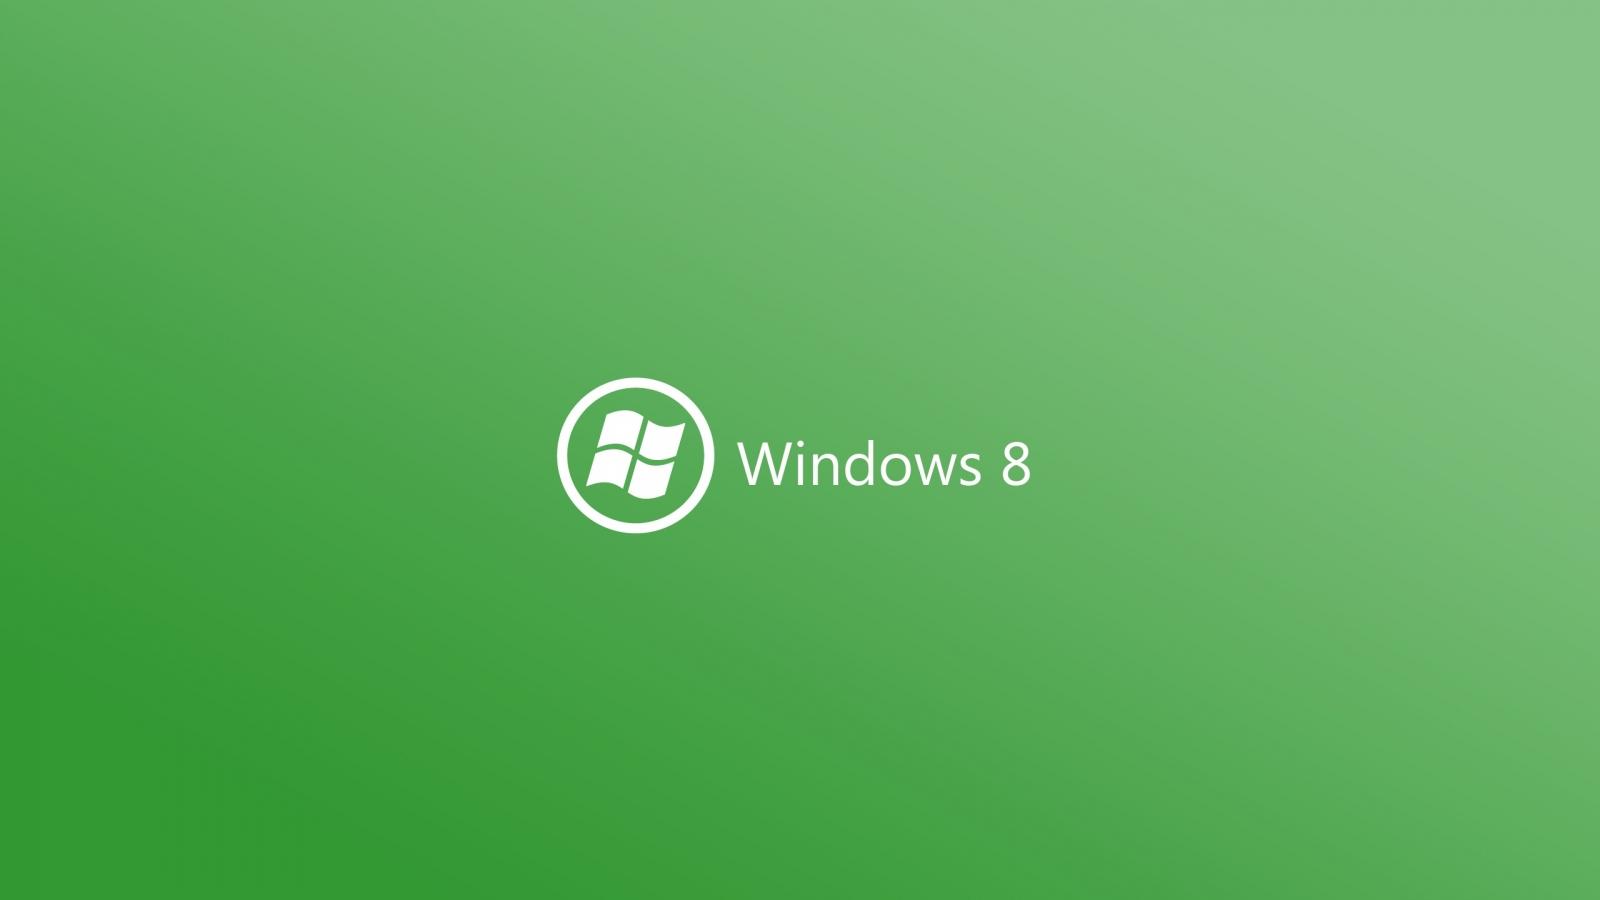 Windows 8 verde - 1600x900